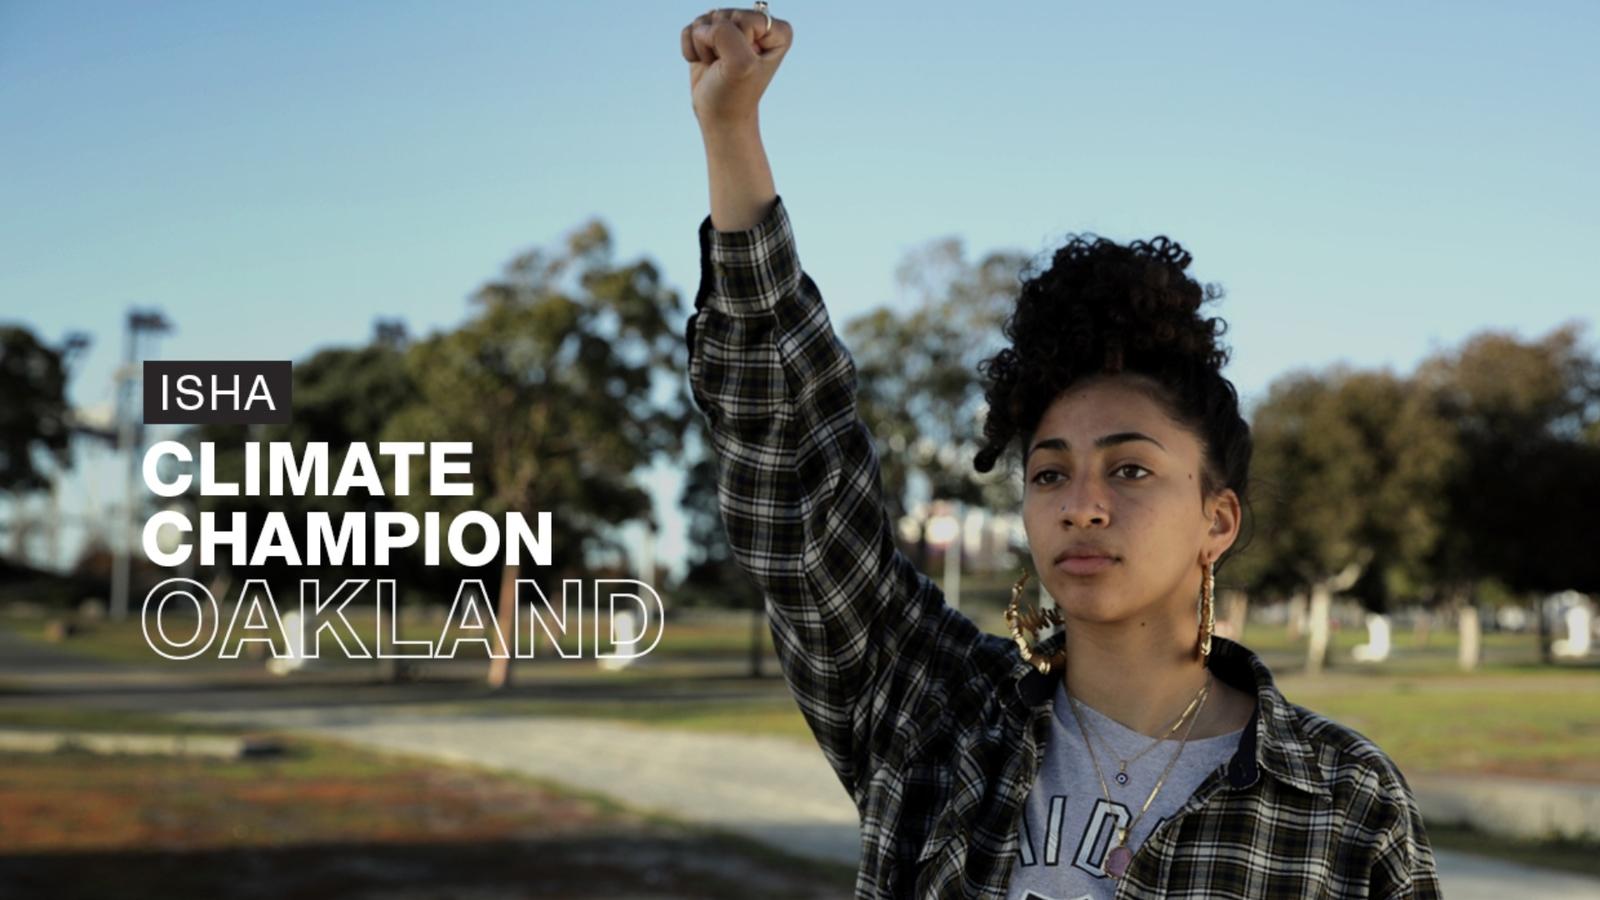 18-year-old activist Isha Clarke champions social, environmental change to avert climate 'apocalypse'